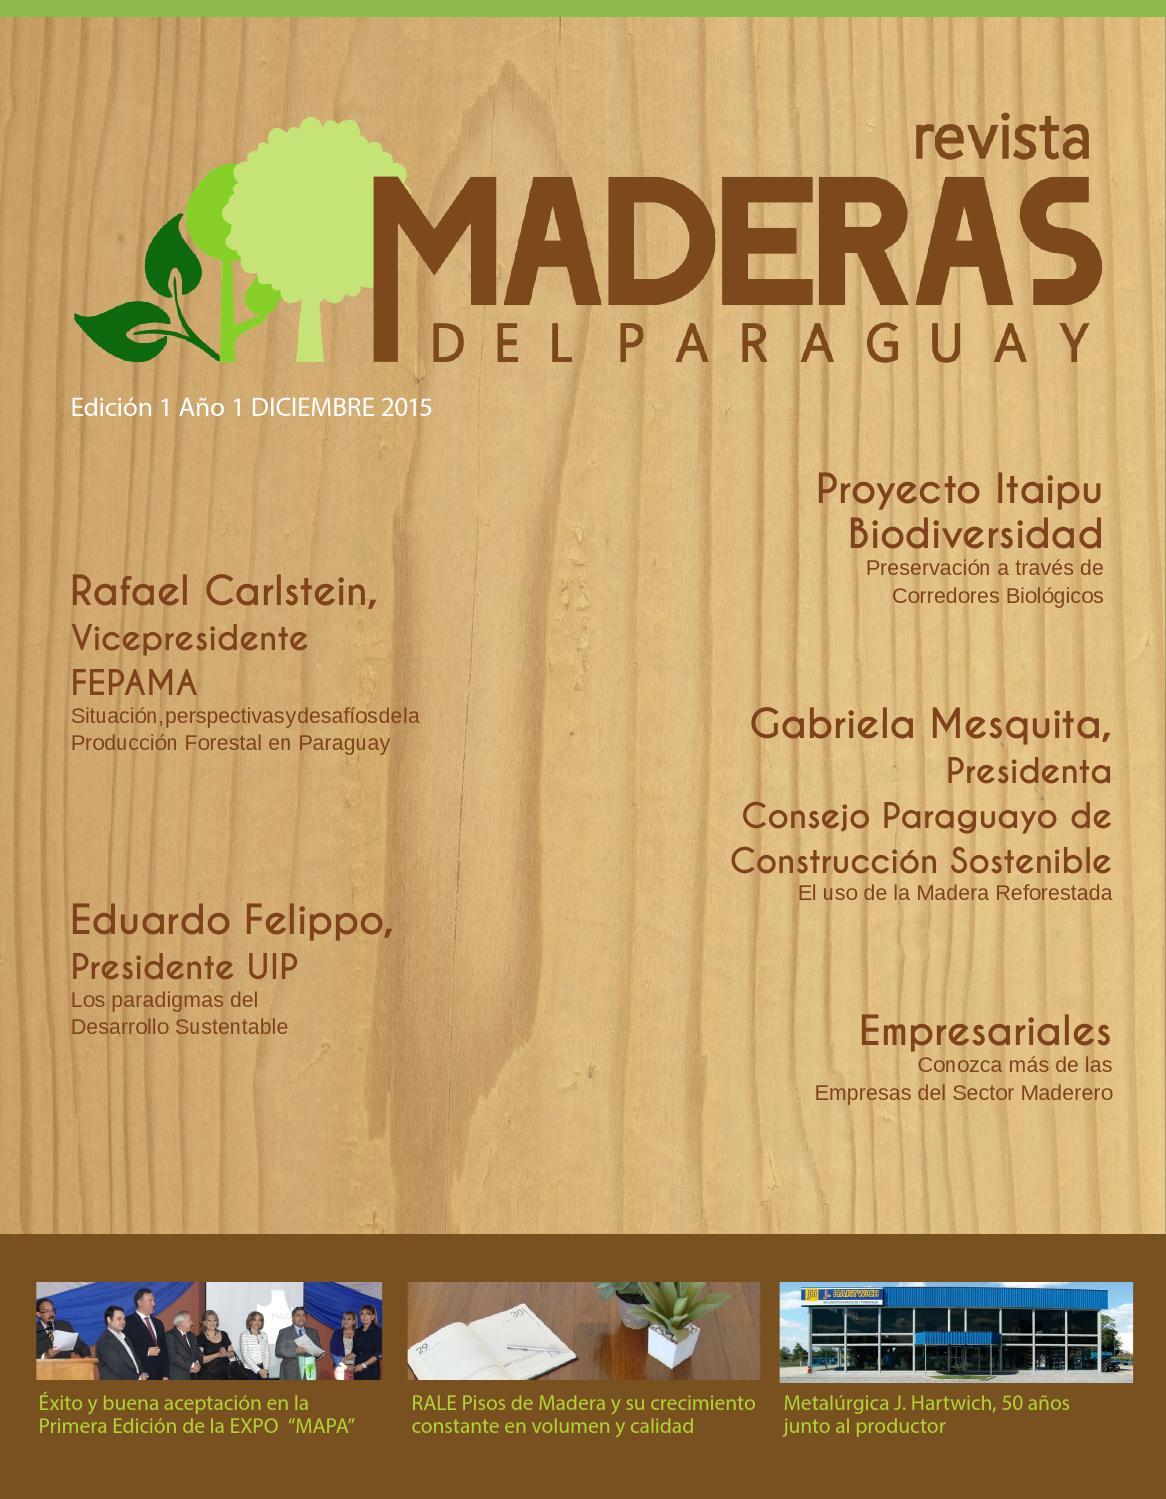 Revista maderas by hugo irala issuu for Muebles irala